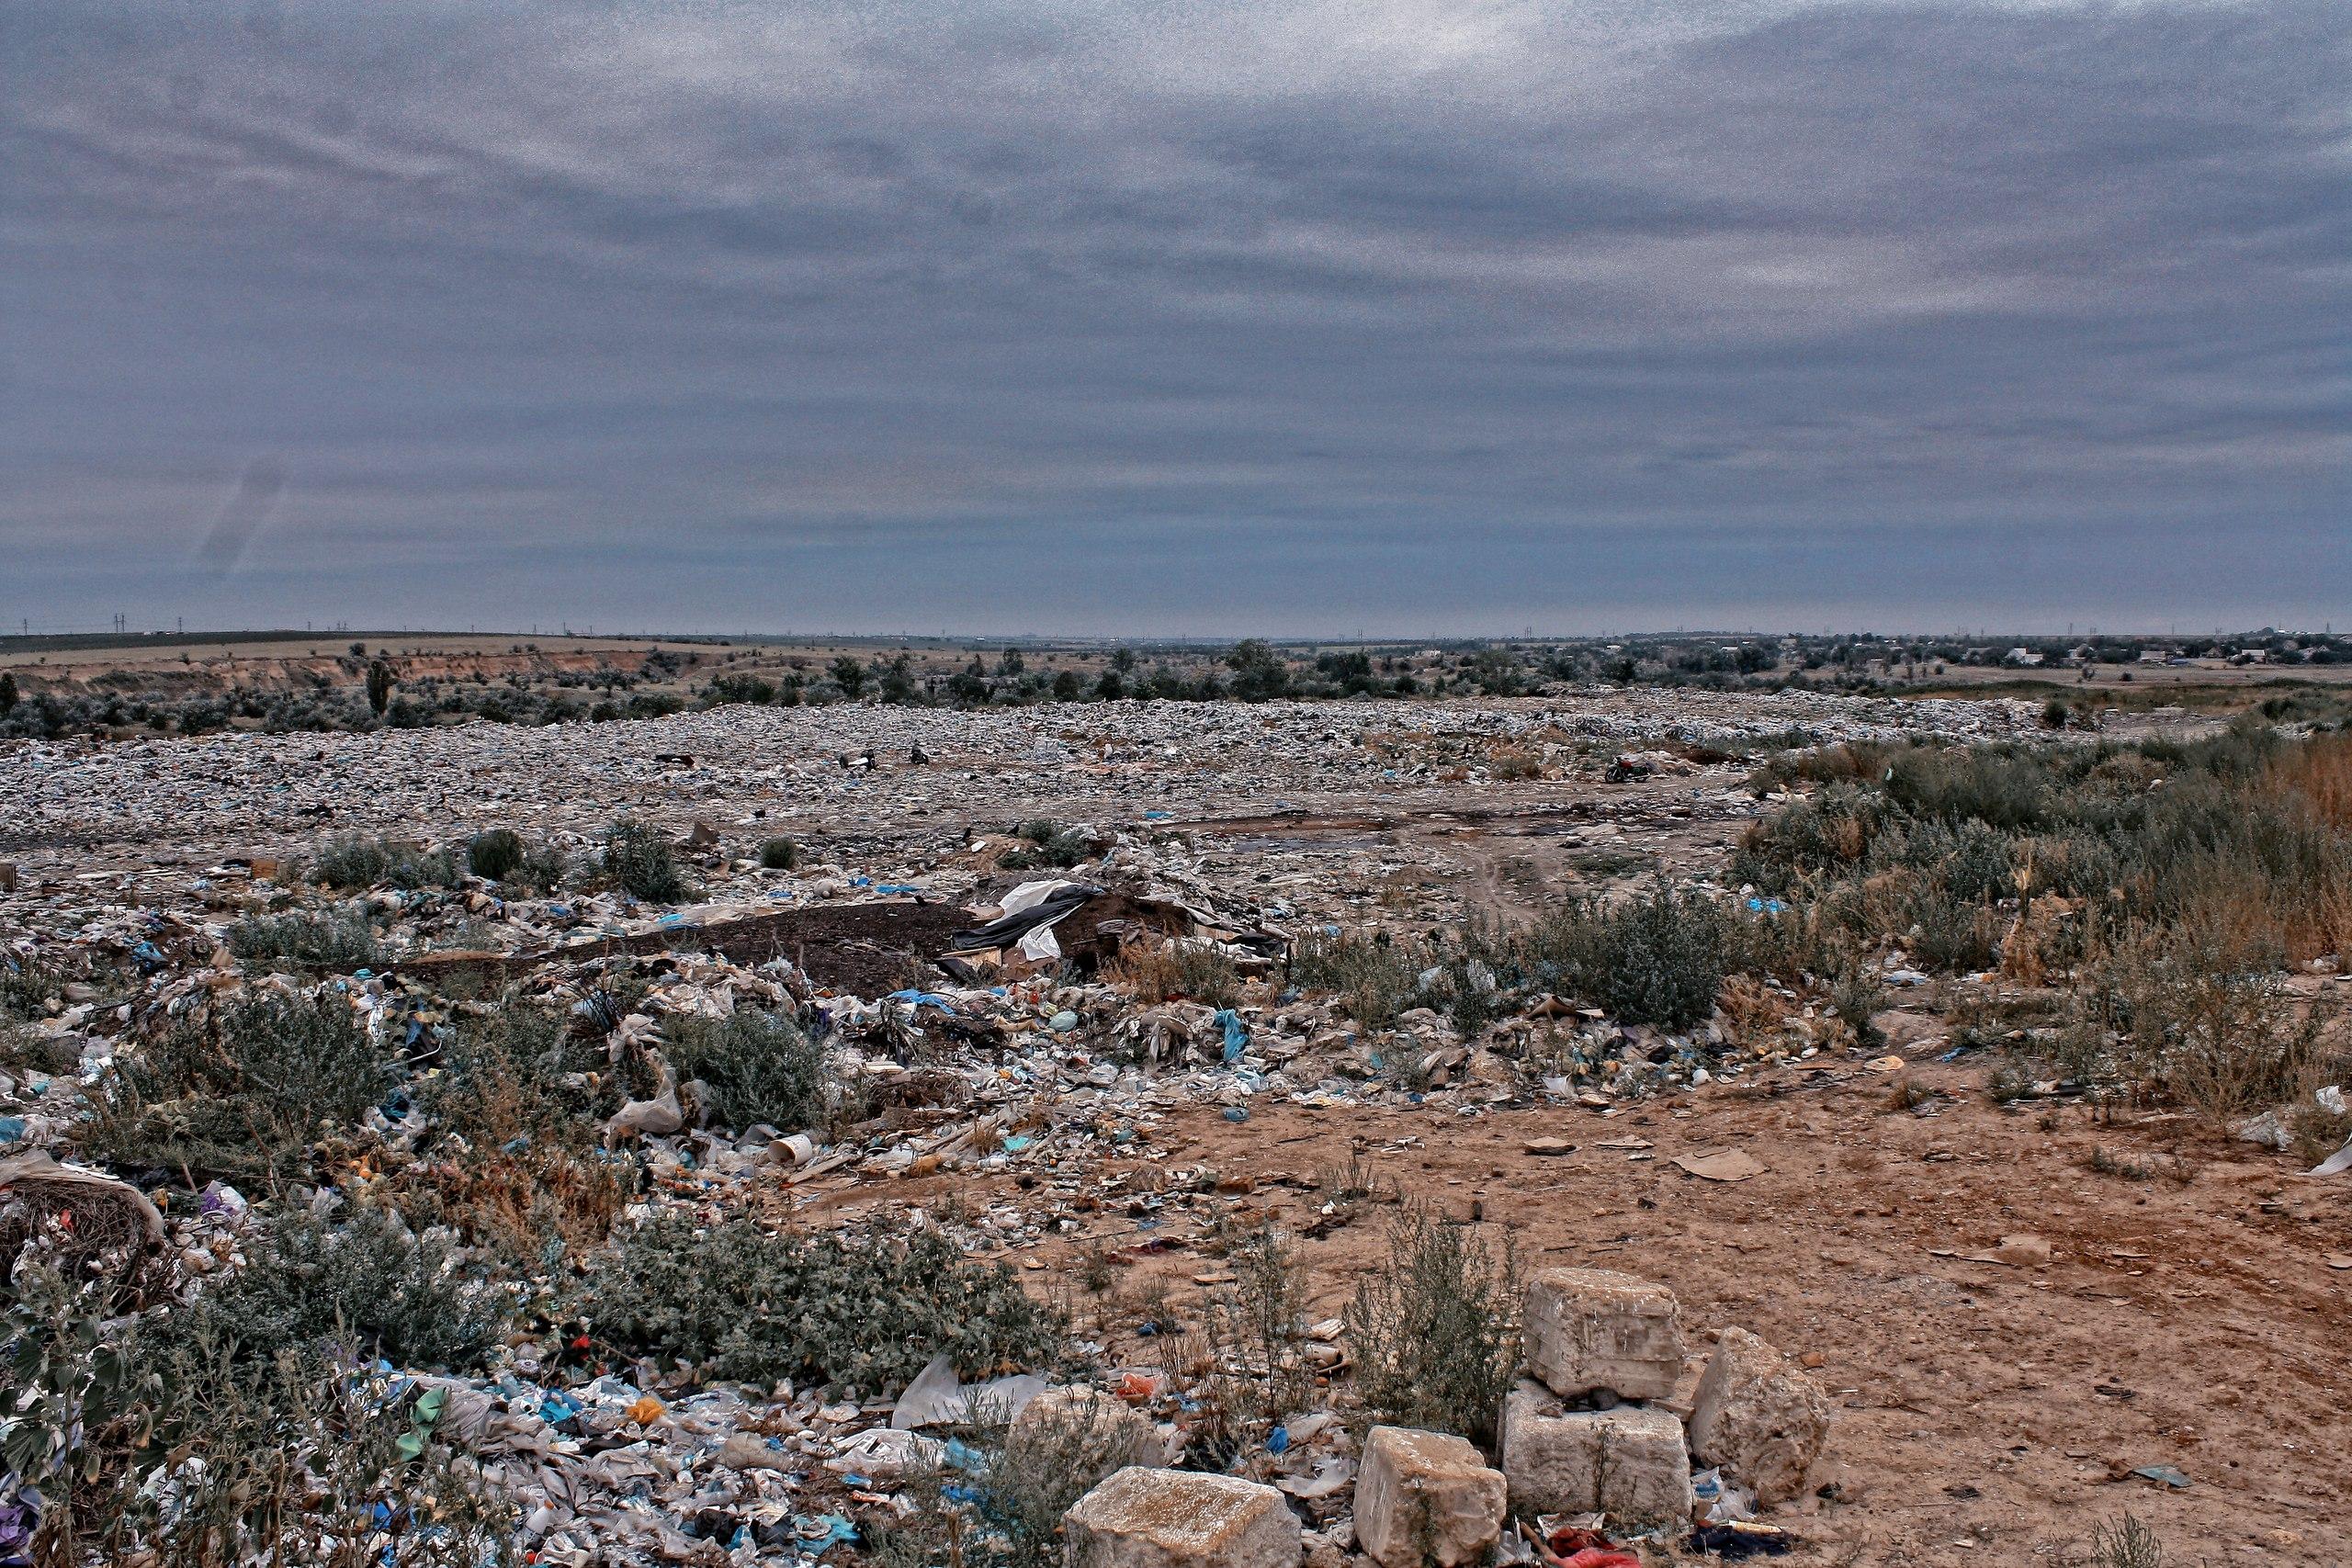 Нам нужно больше мусора - Владимир Миколаенко (фото)